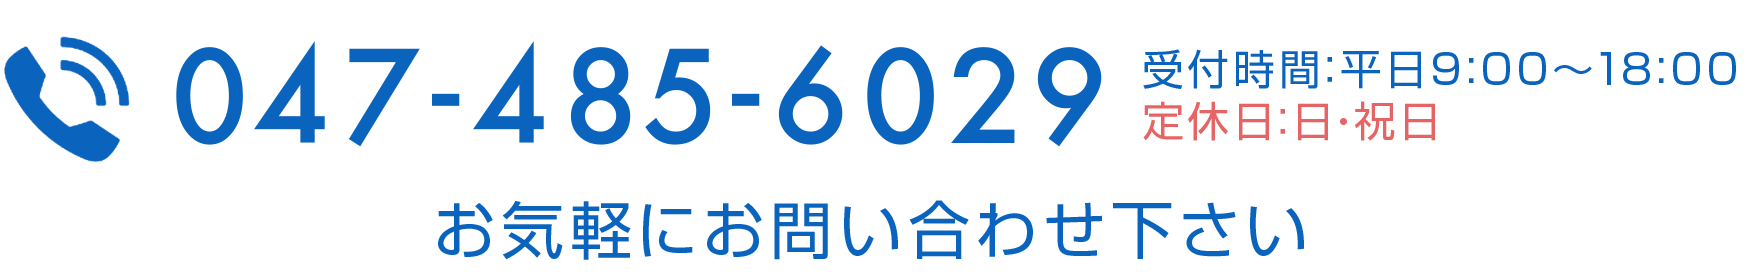 047-485-6029